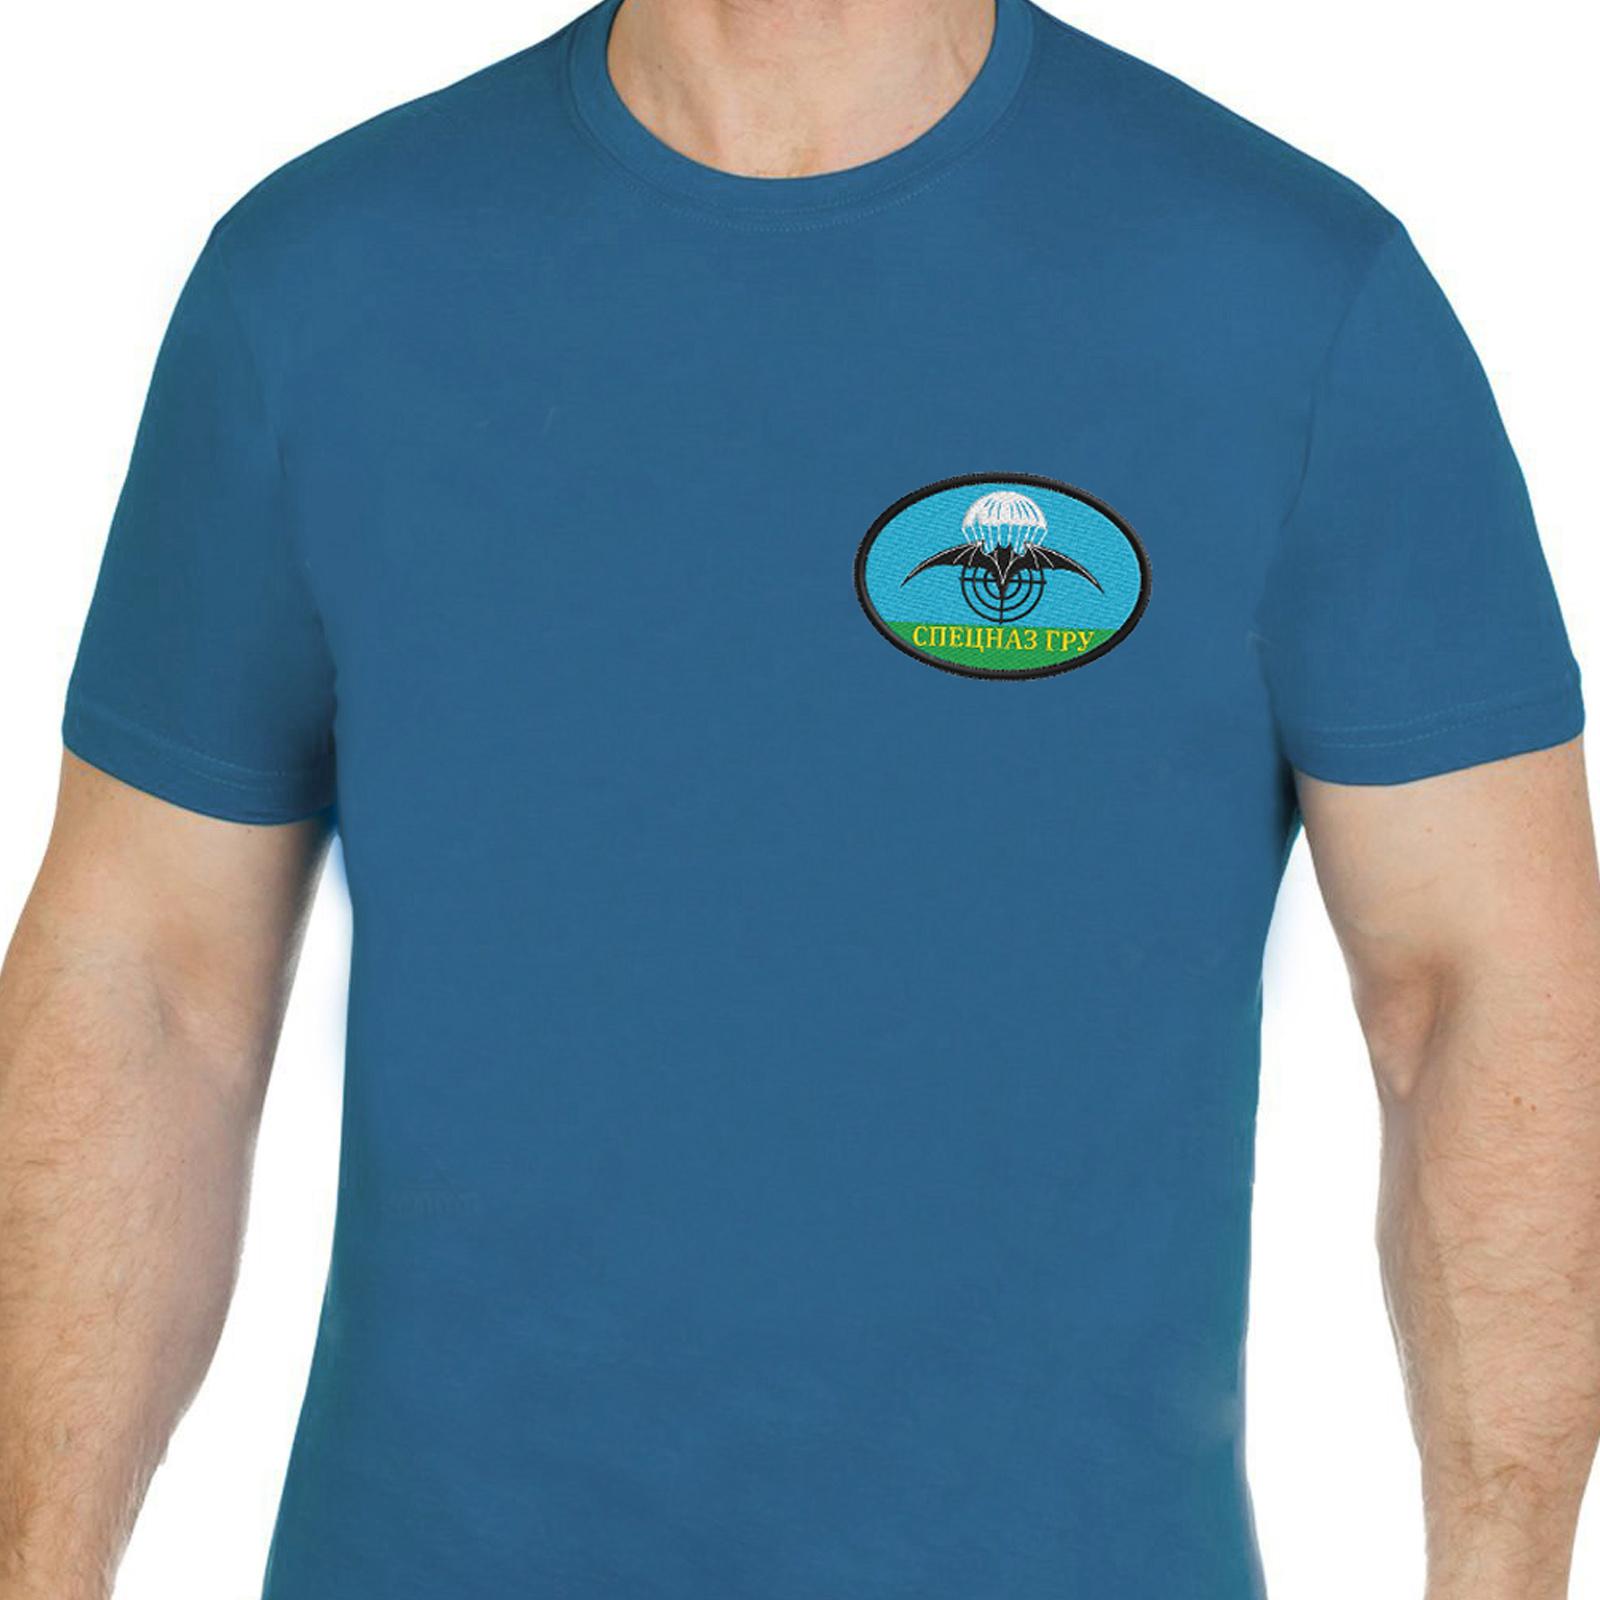 Чёткая футболка с вышивкой спецназ ГРУ